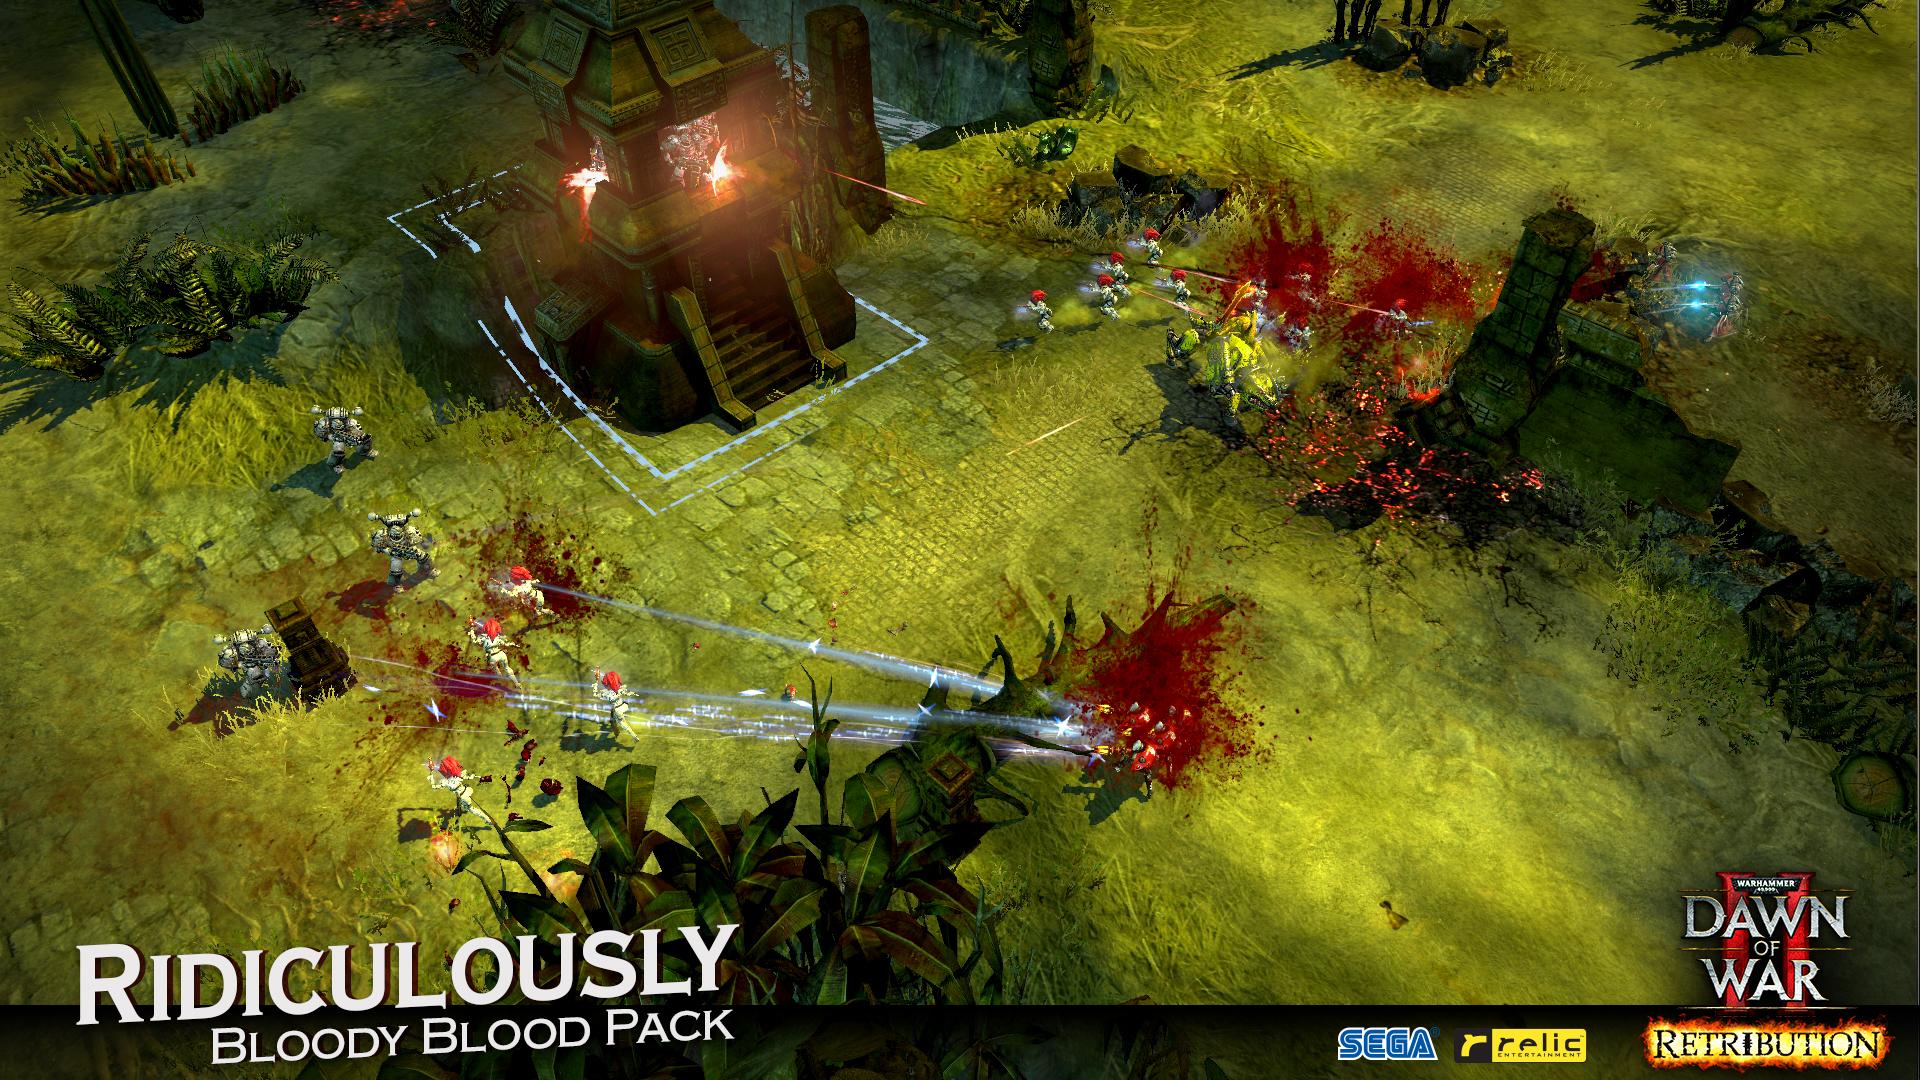 Warhammer 40,000: Dawn of War II - Retribution - Ridiculously Bloody Blood Pack screenshot